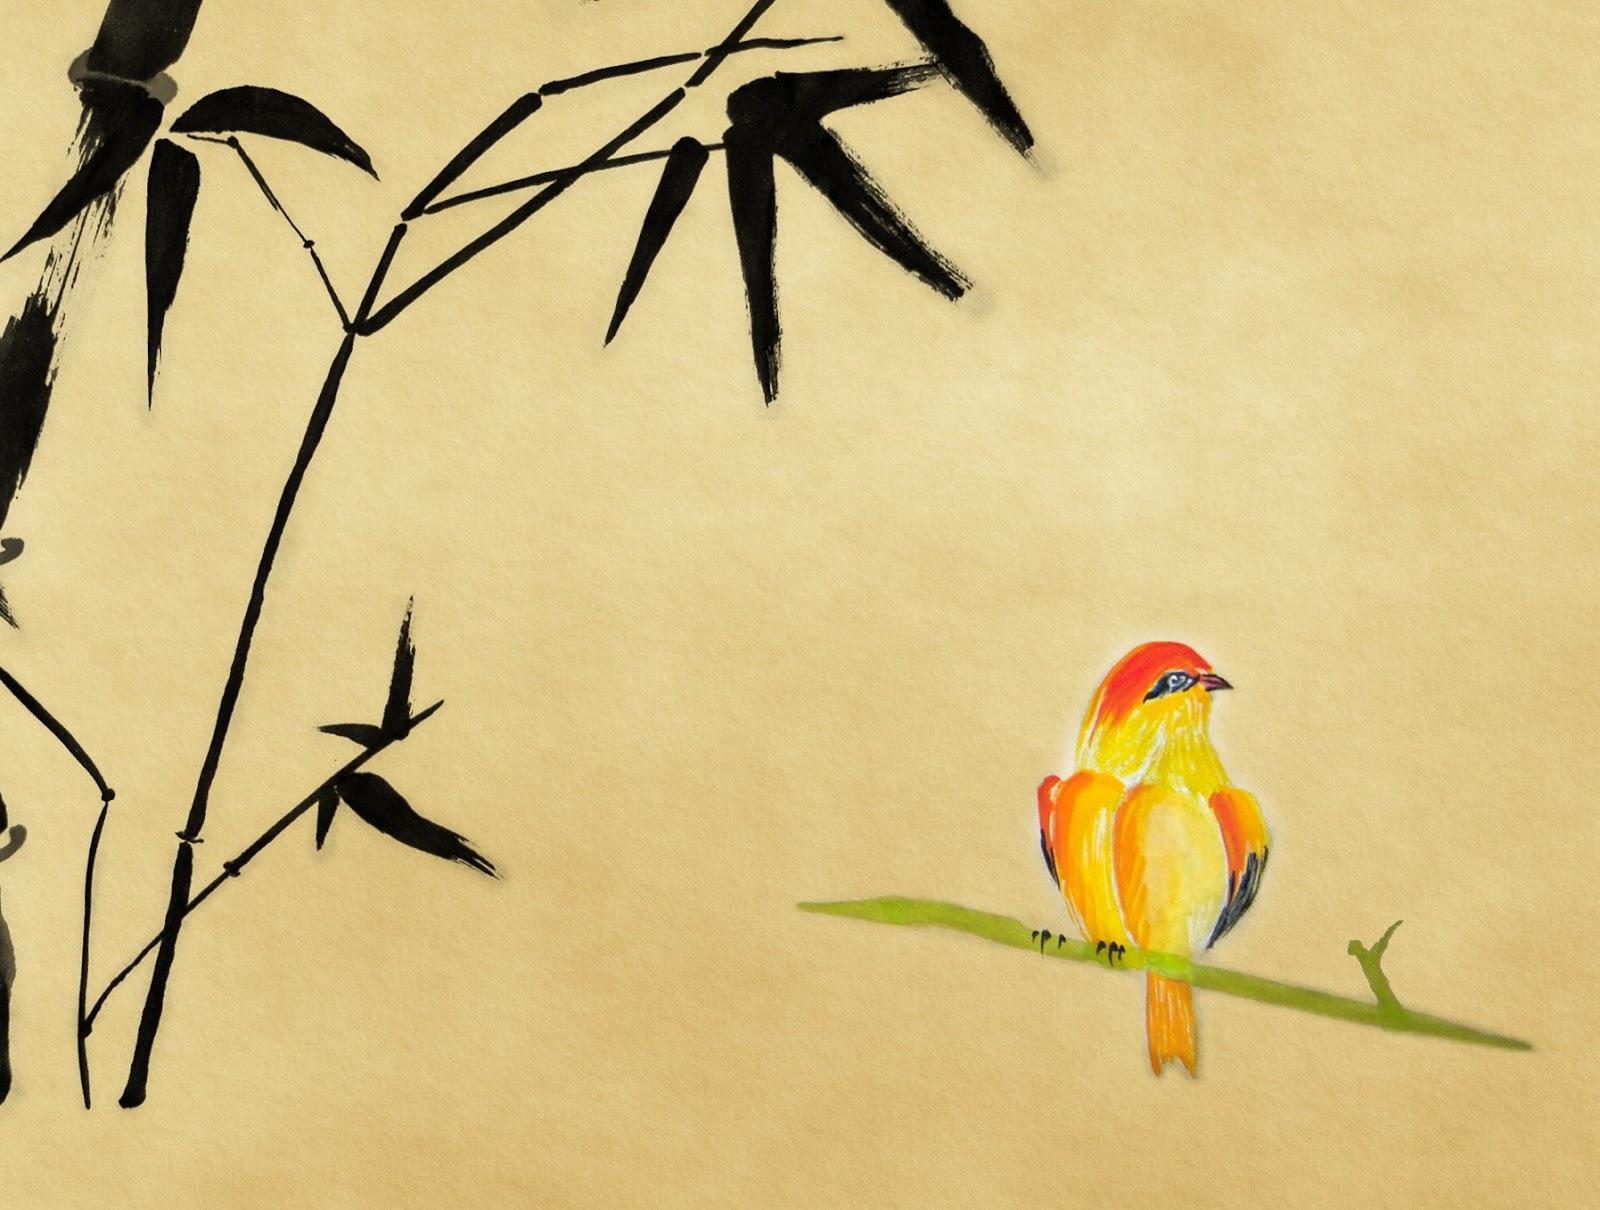 http://3.bp.blogspot.com/-VwKy6WnXnHE/T5wFuNTpCNI/AAAAAAAABKg/IRtsahedUOw/s1600/wallpaper-1622640.jpg